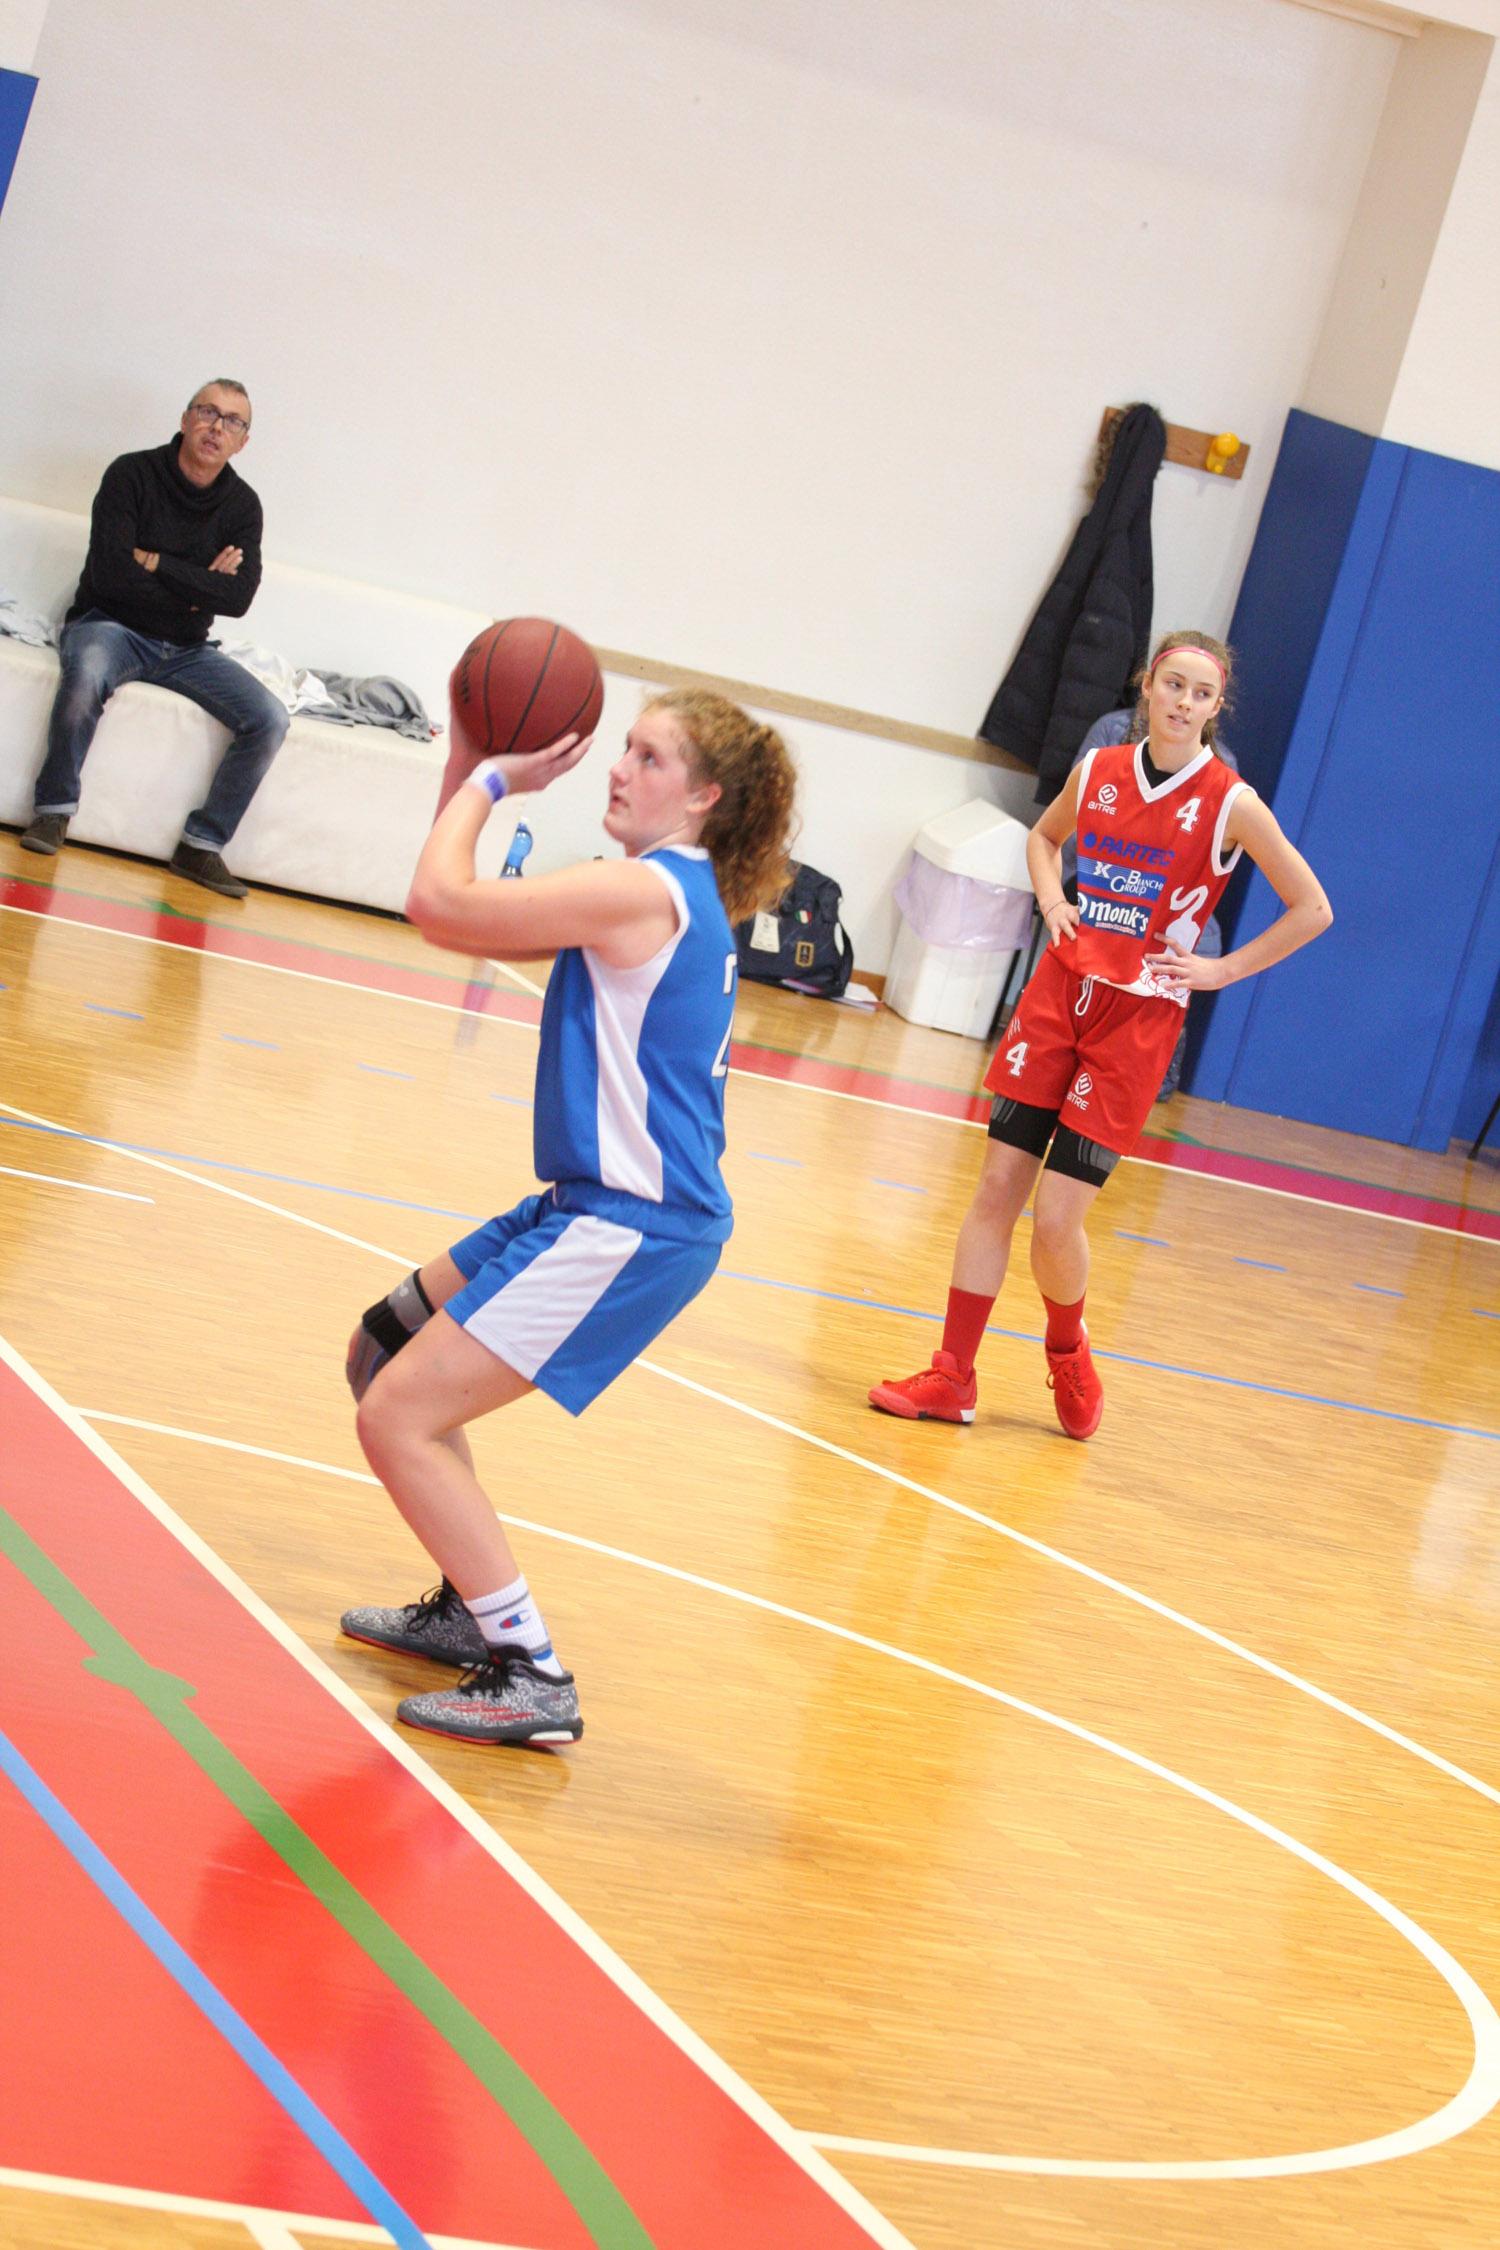 U16E - Costa Masnaga vs Baskettiamo Vittuone 2001 00023.jpg